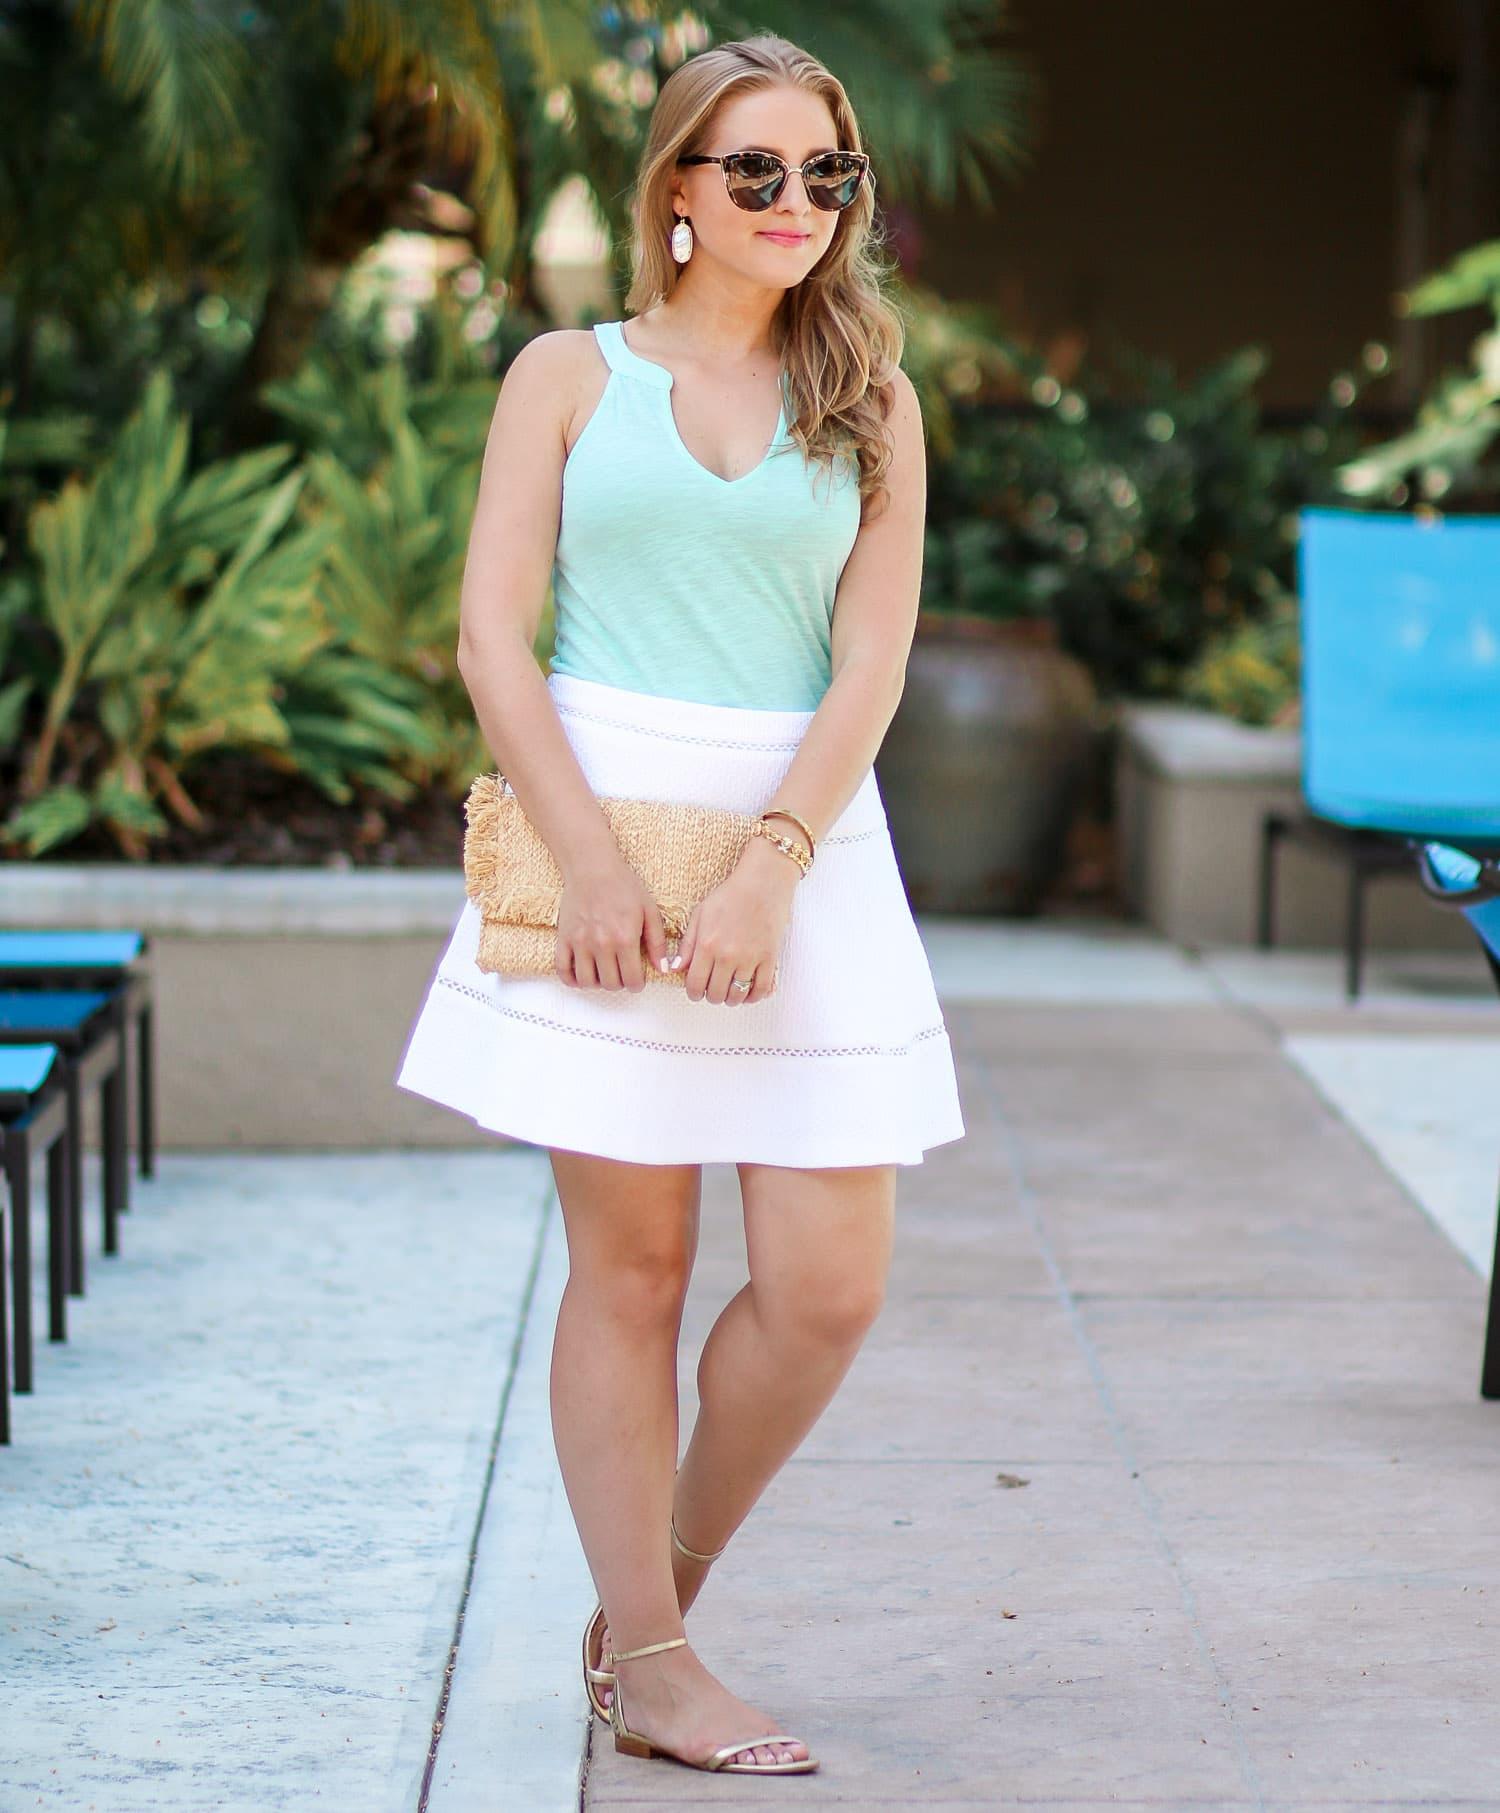 lilly-pulitzer-arya-gold-pineapple-sandals-quay-my-girl-sunglasses-banana-republic-white-skirt-ashley-brooke-3115-11